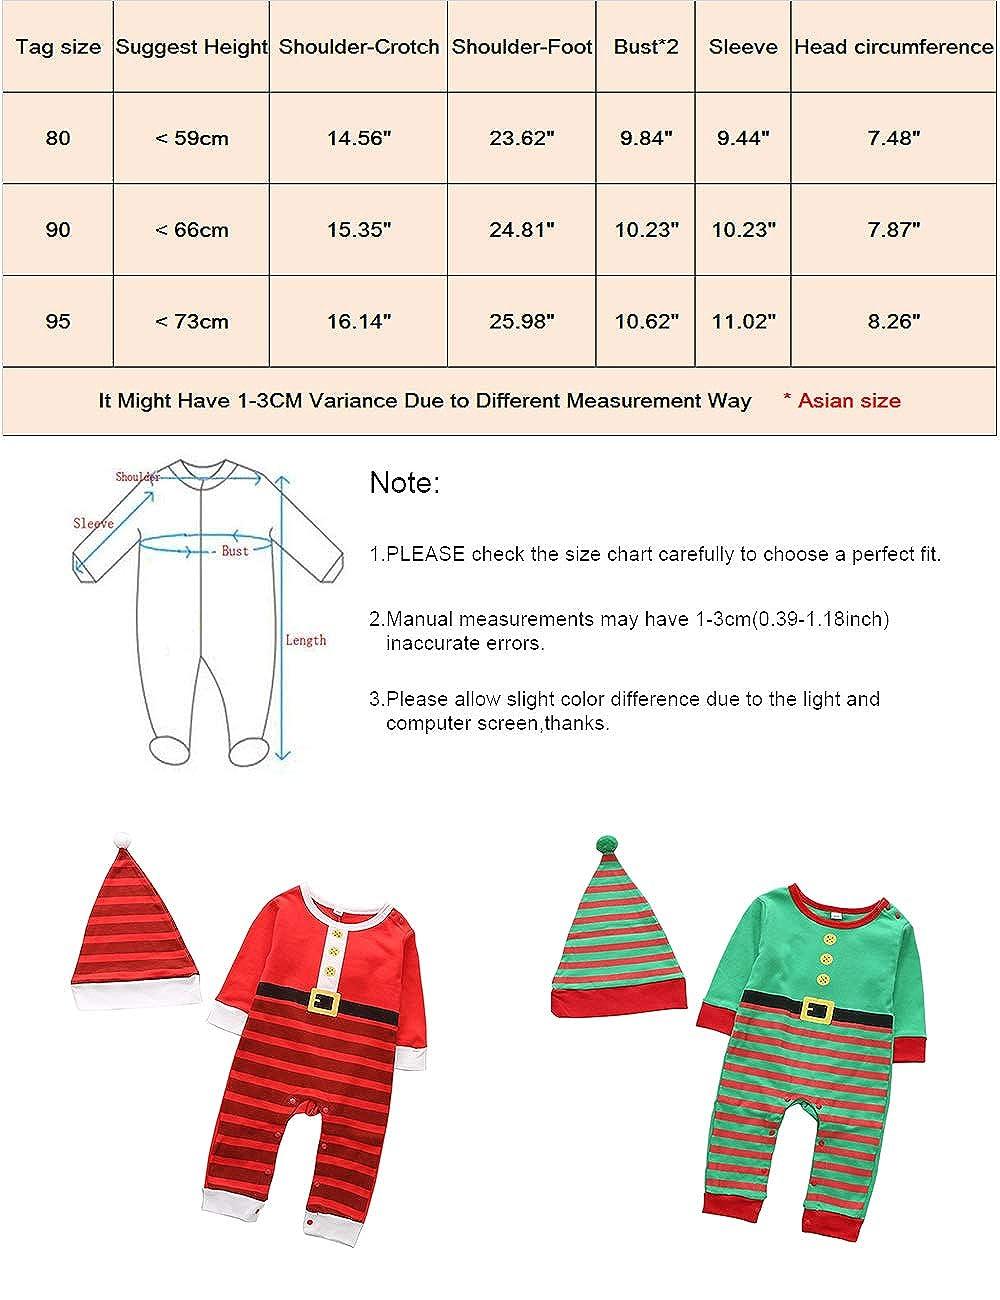 0-2 A/ños de Edad Beb/é Trajes Manga Larga Pijama BESBOMIG Ni/ñito Beb/é Mameluco Navidad Trajes Ni/ños Mono